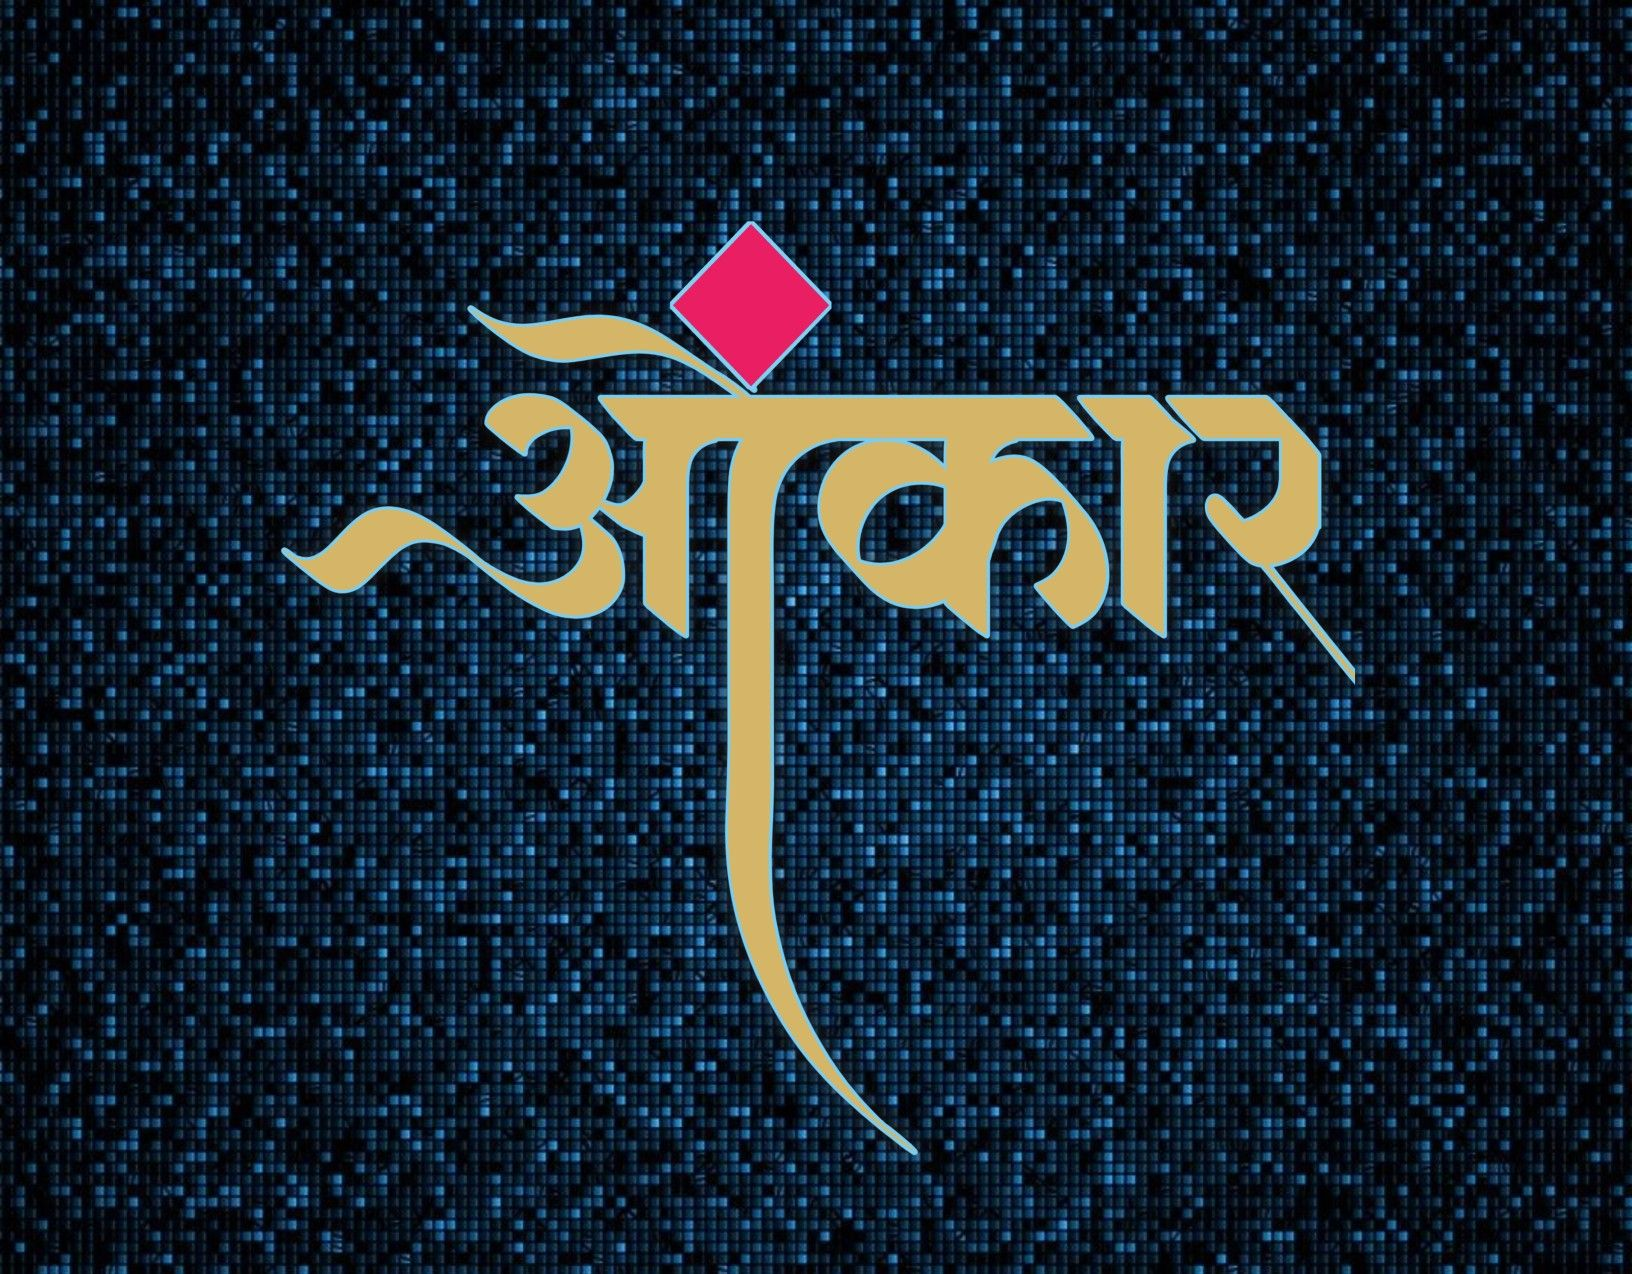 Omkar name Marathi Clligraphy Hindi Calligraphy in 2019.